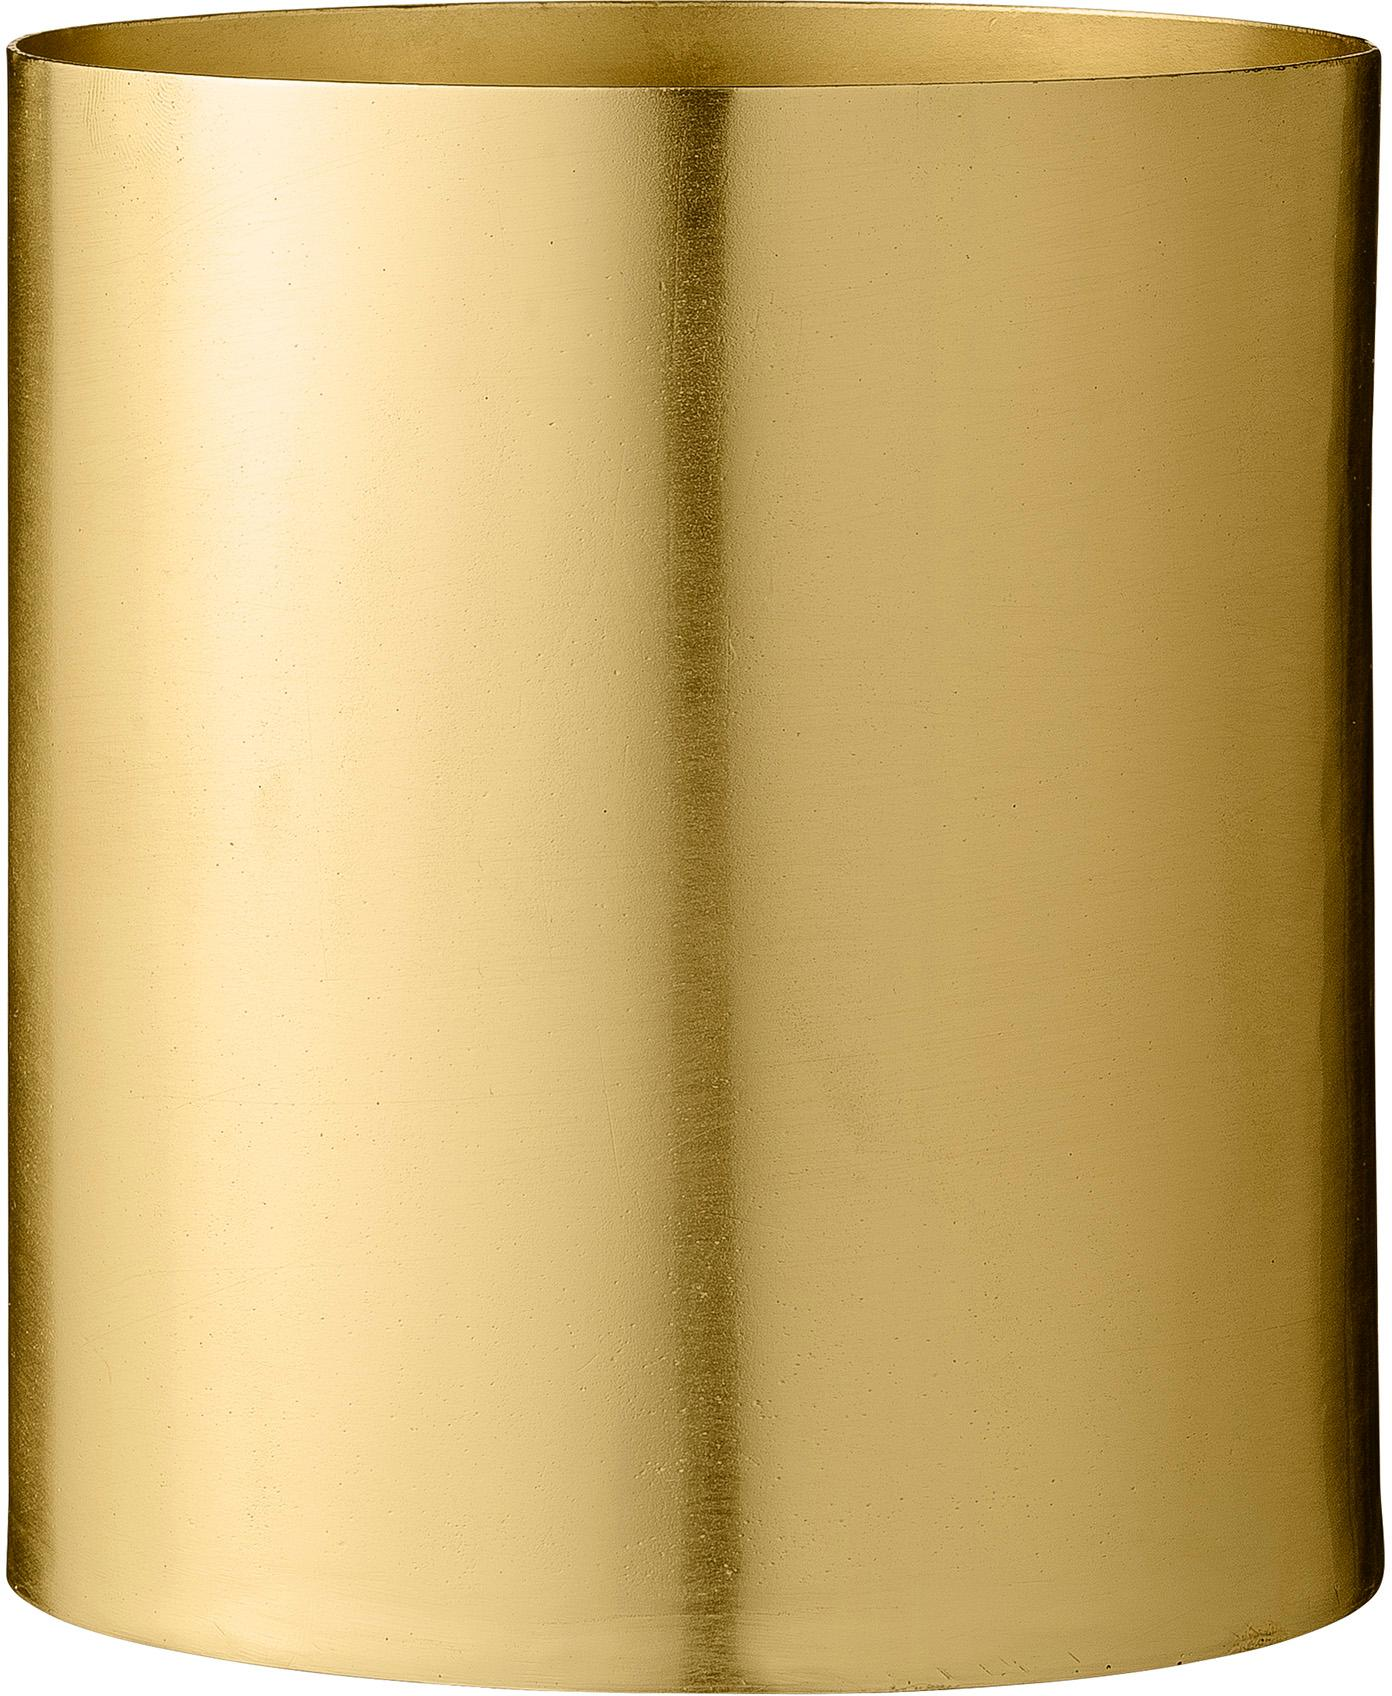 Portavaso Sharin, Metallo, Ottone, Ø 13 x A lt.14 cm